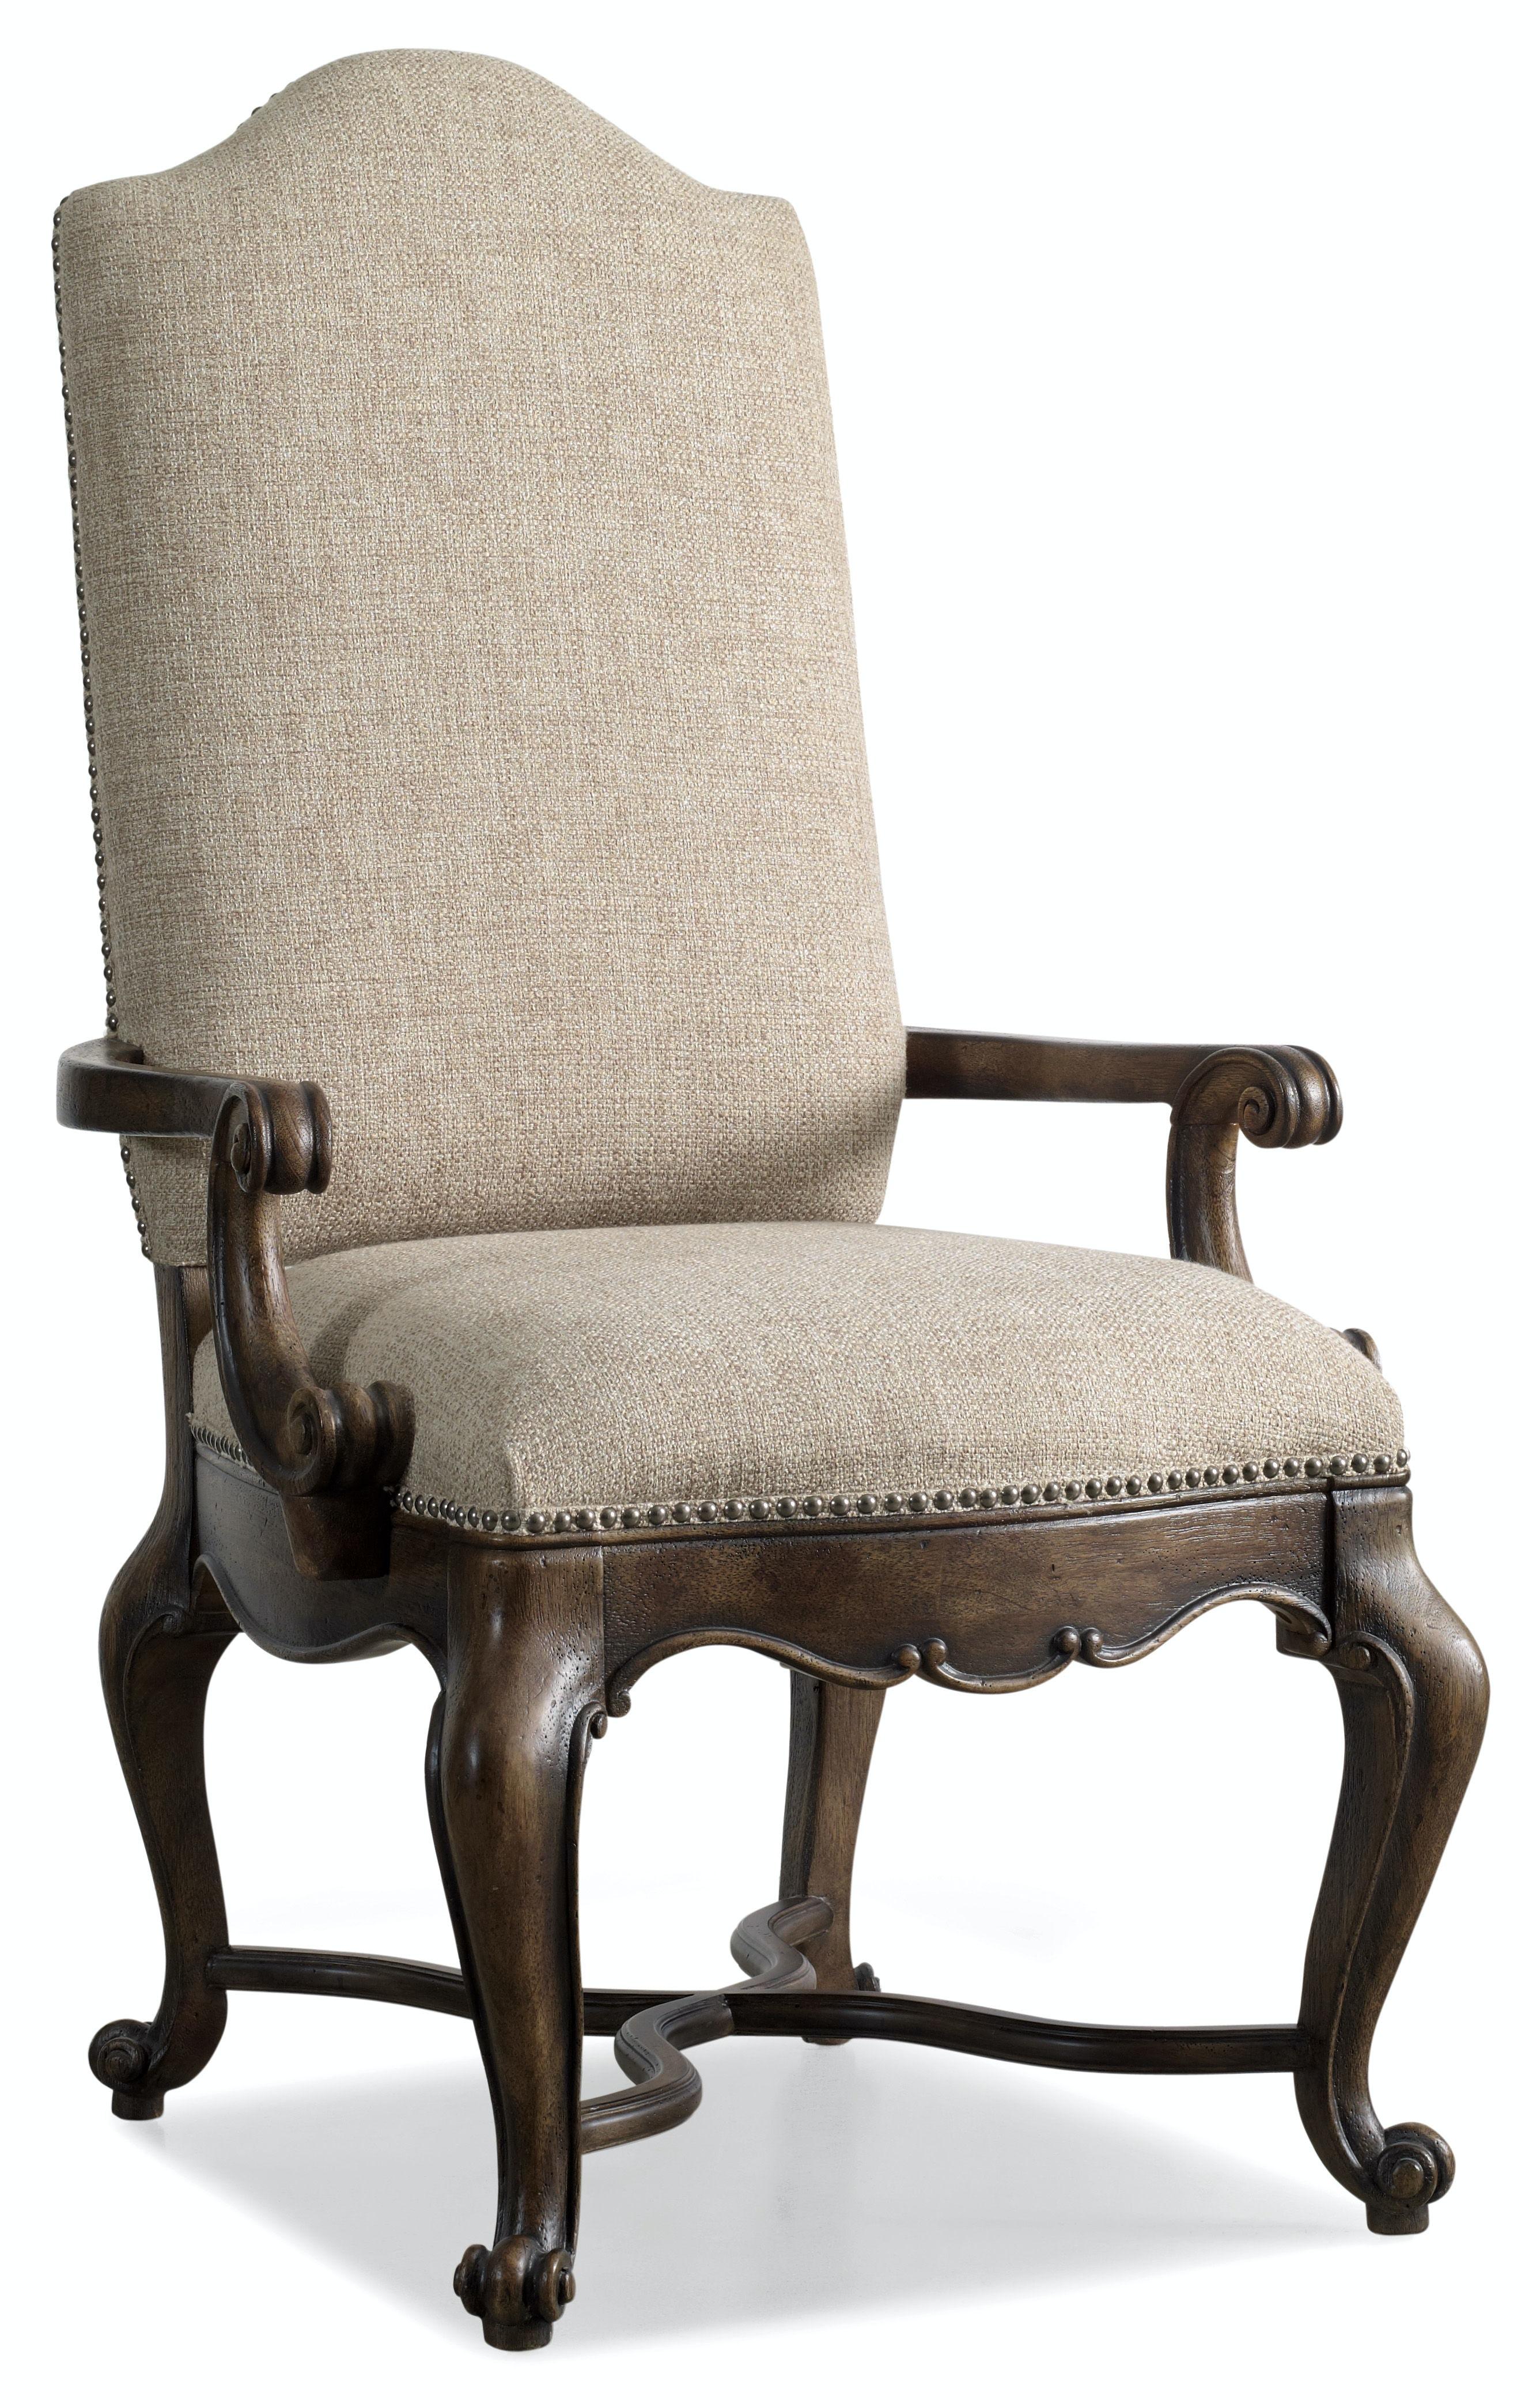 Hooker Furniture Dining Room Rhapsody Upholstered Arm